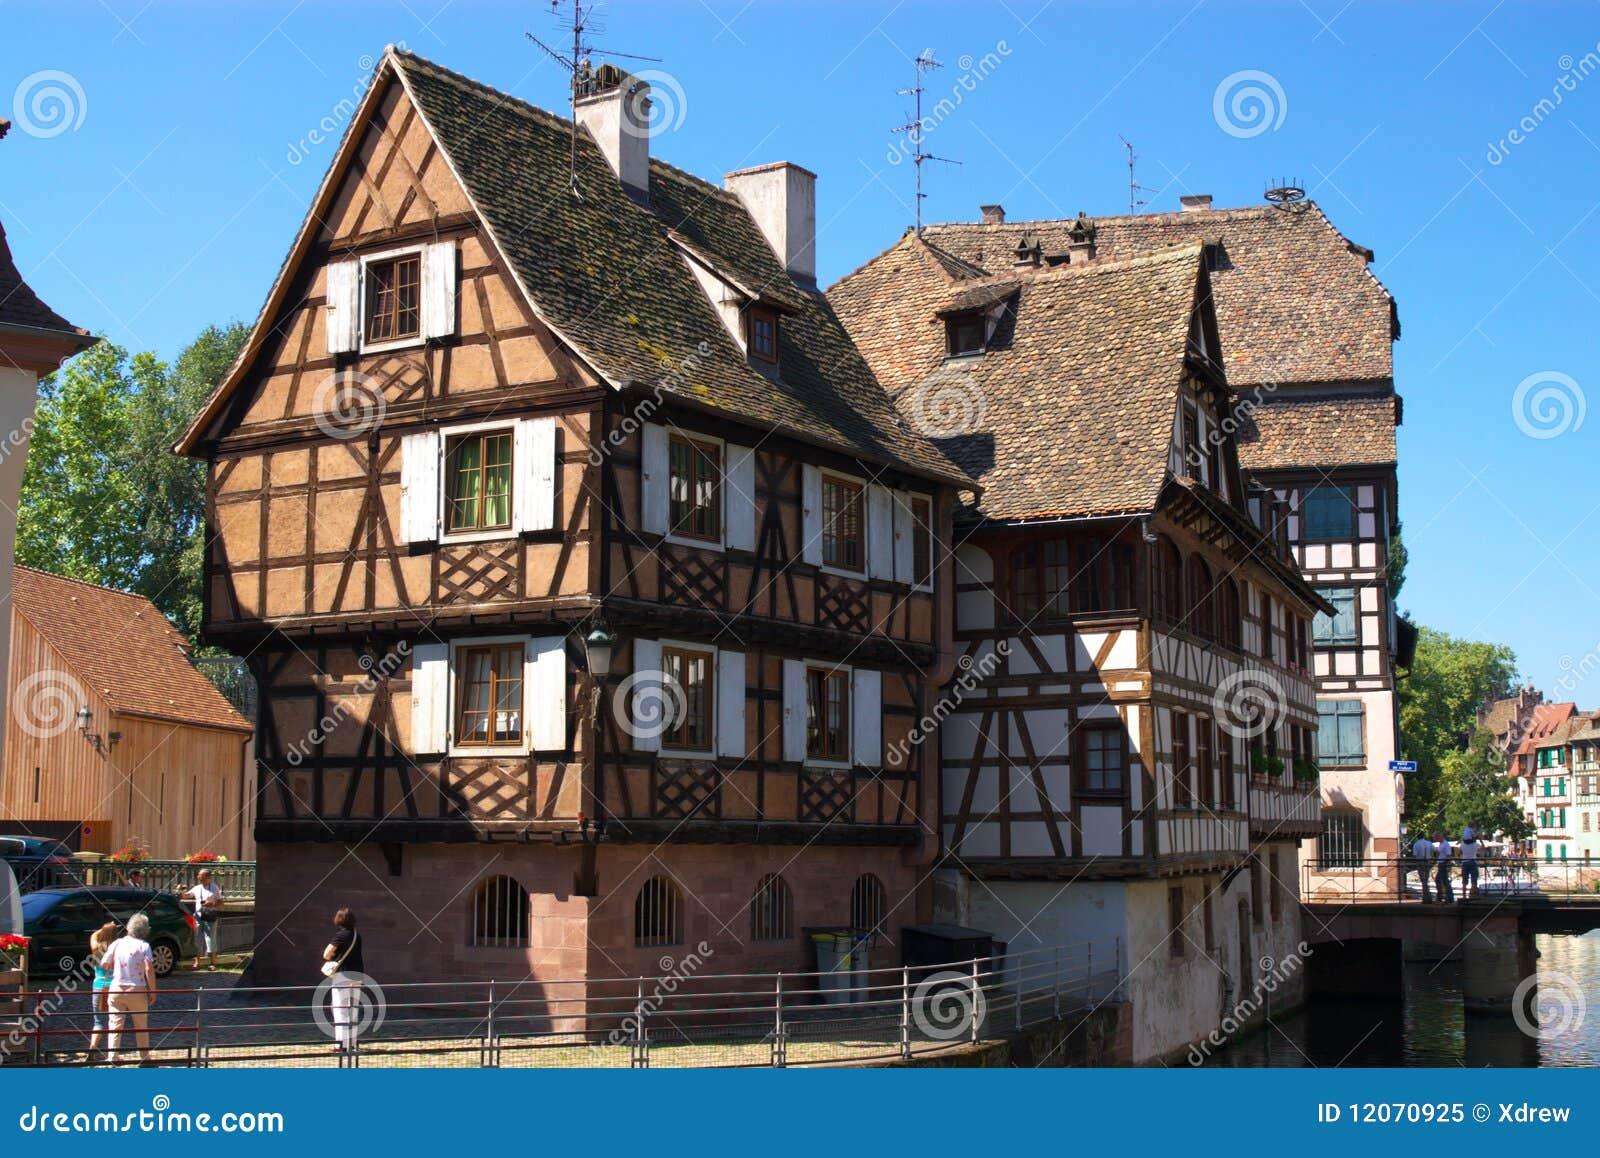 Strasbourg architecture royalty free stock photo image for Strasbourg architecture